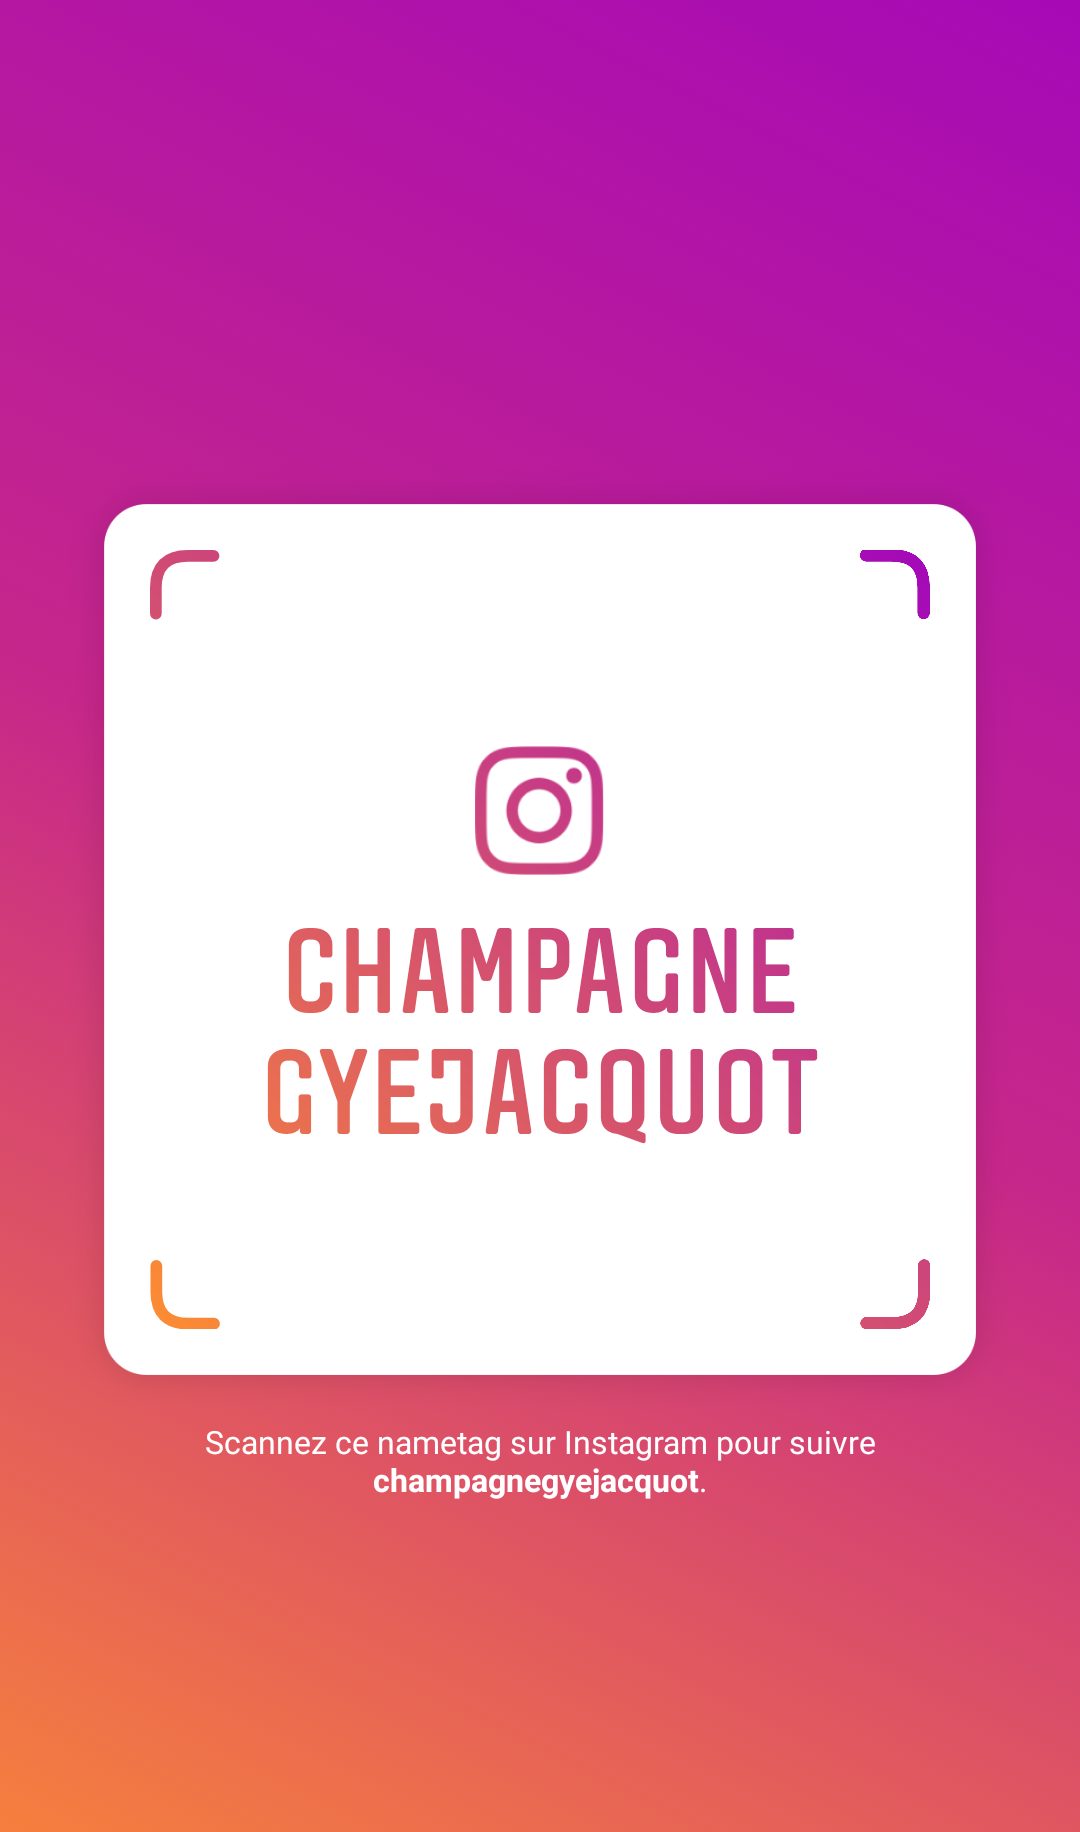 champagne gyejacquot instagram